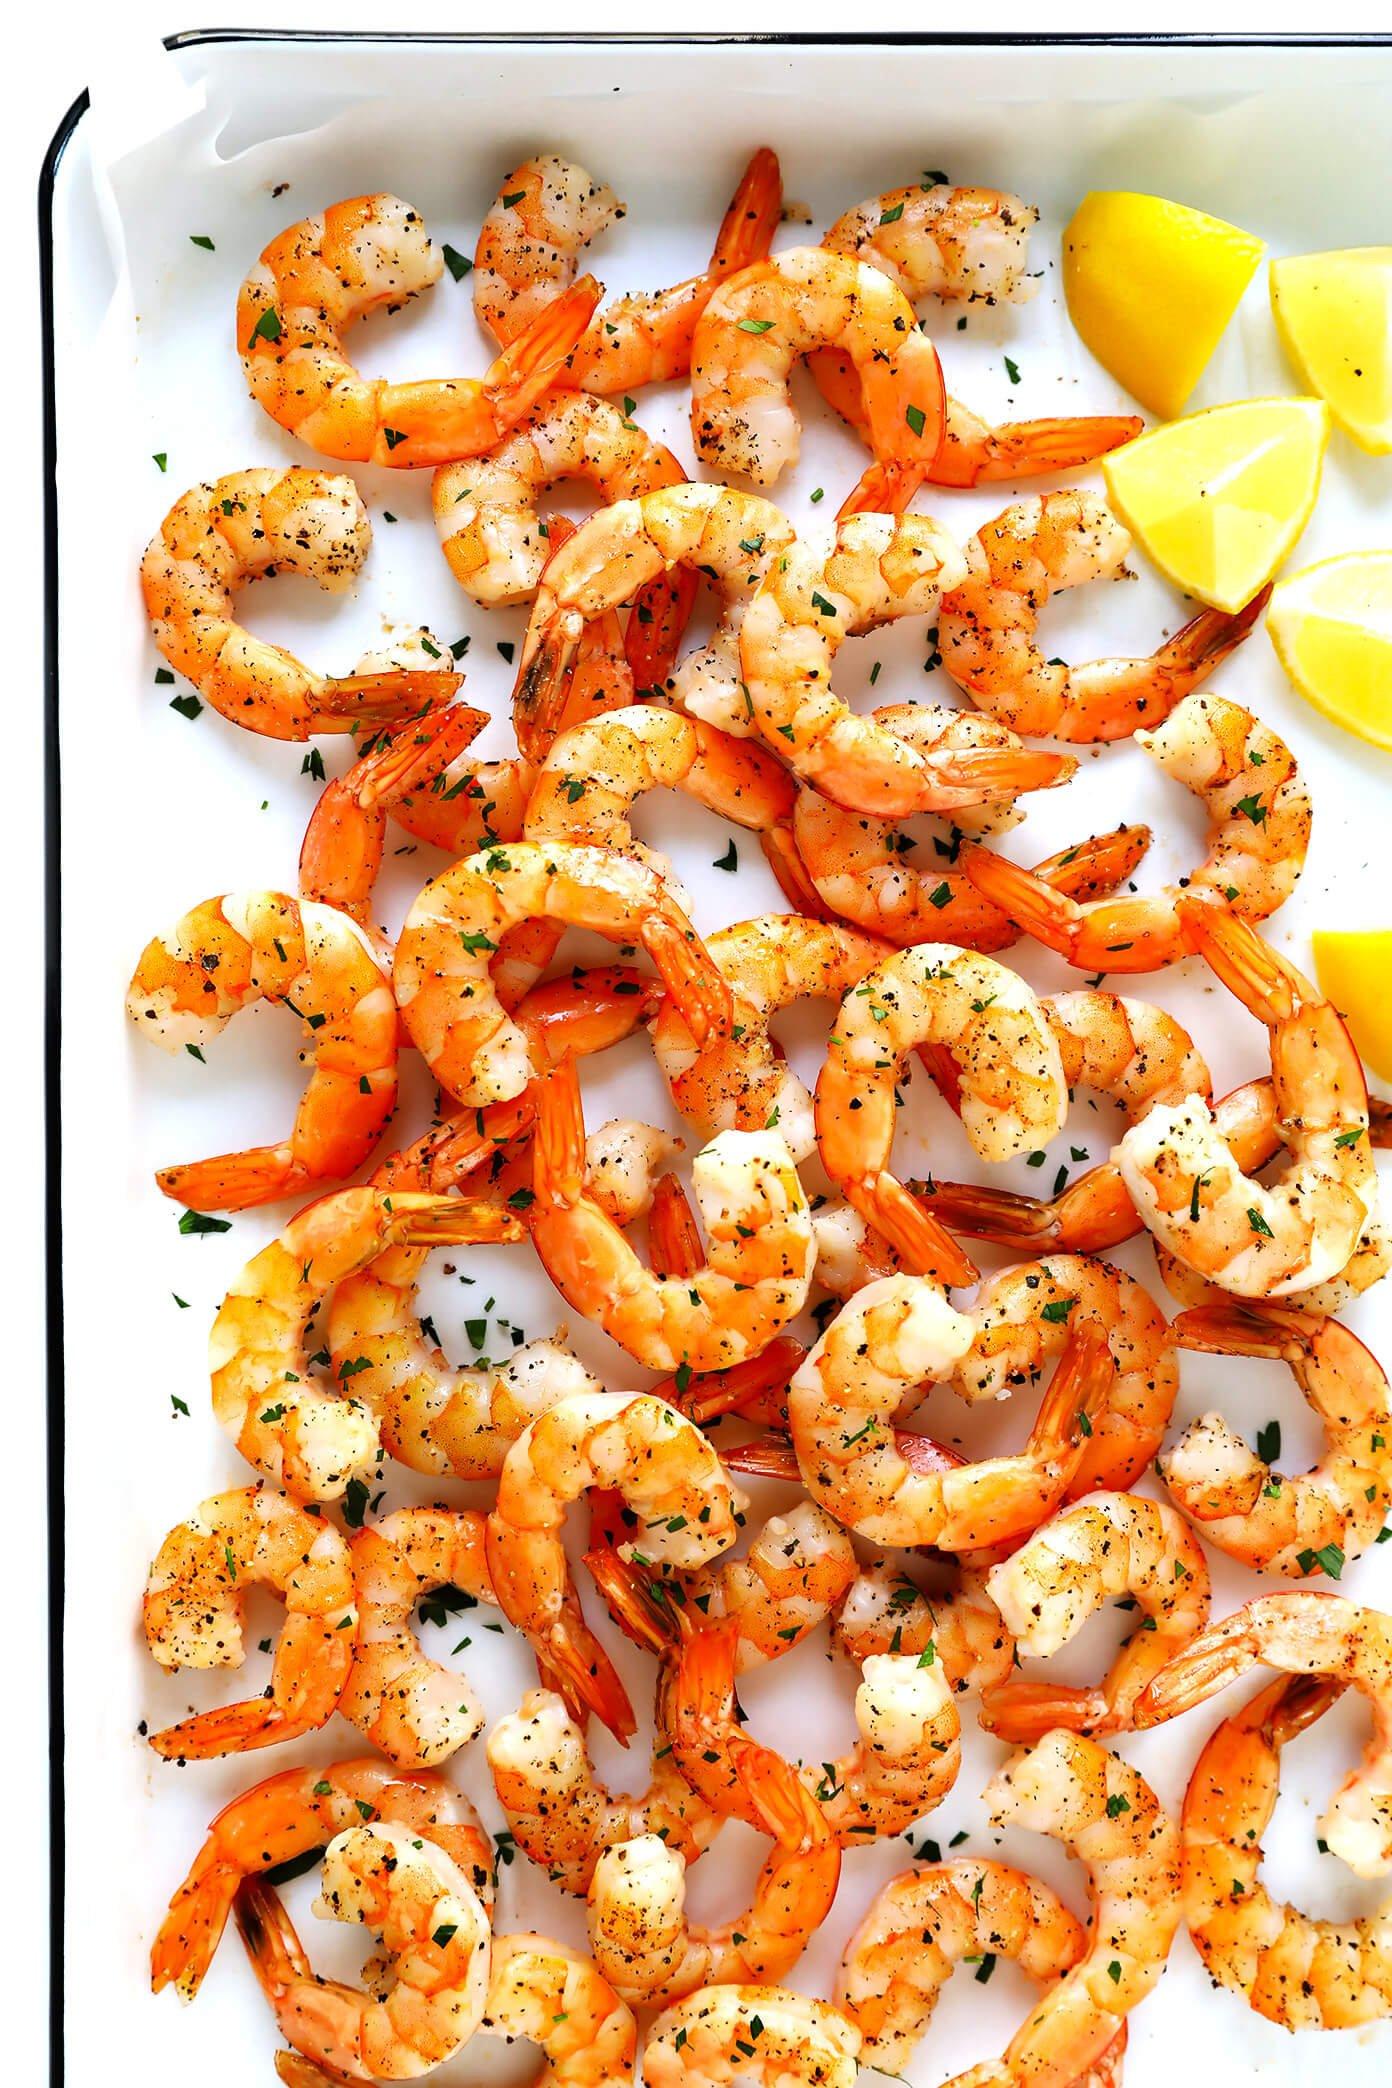 Oven Roasted Shrimp with Lemon